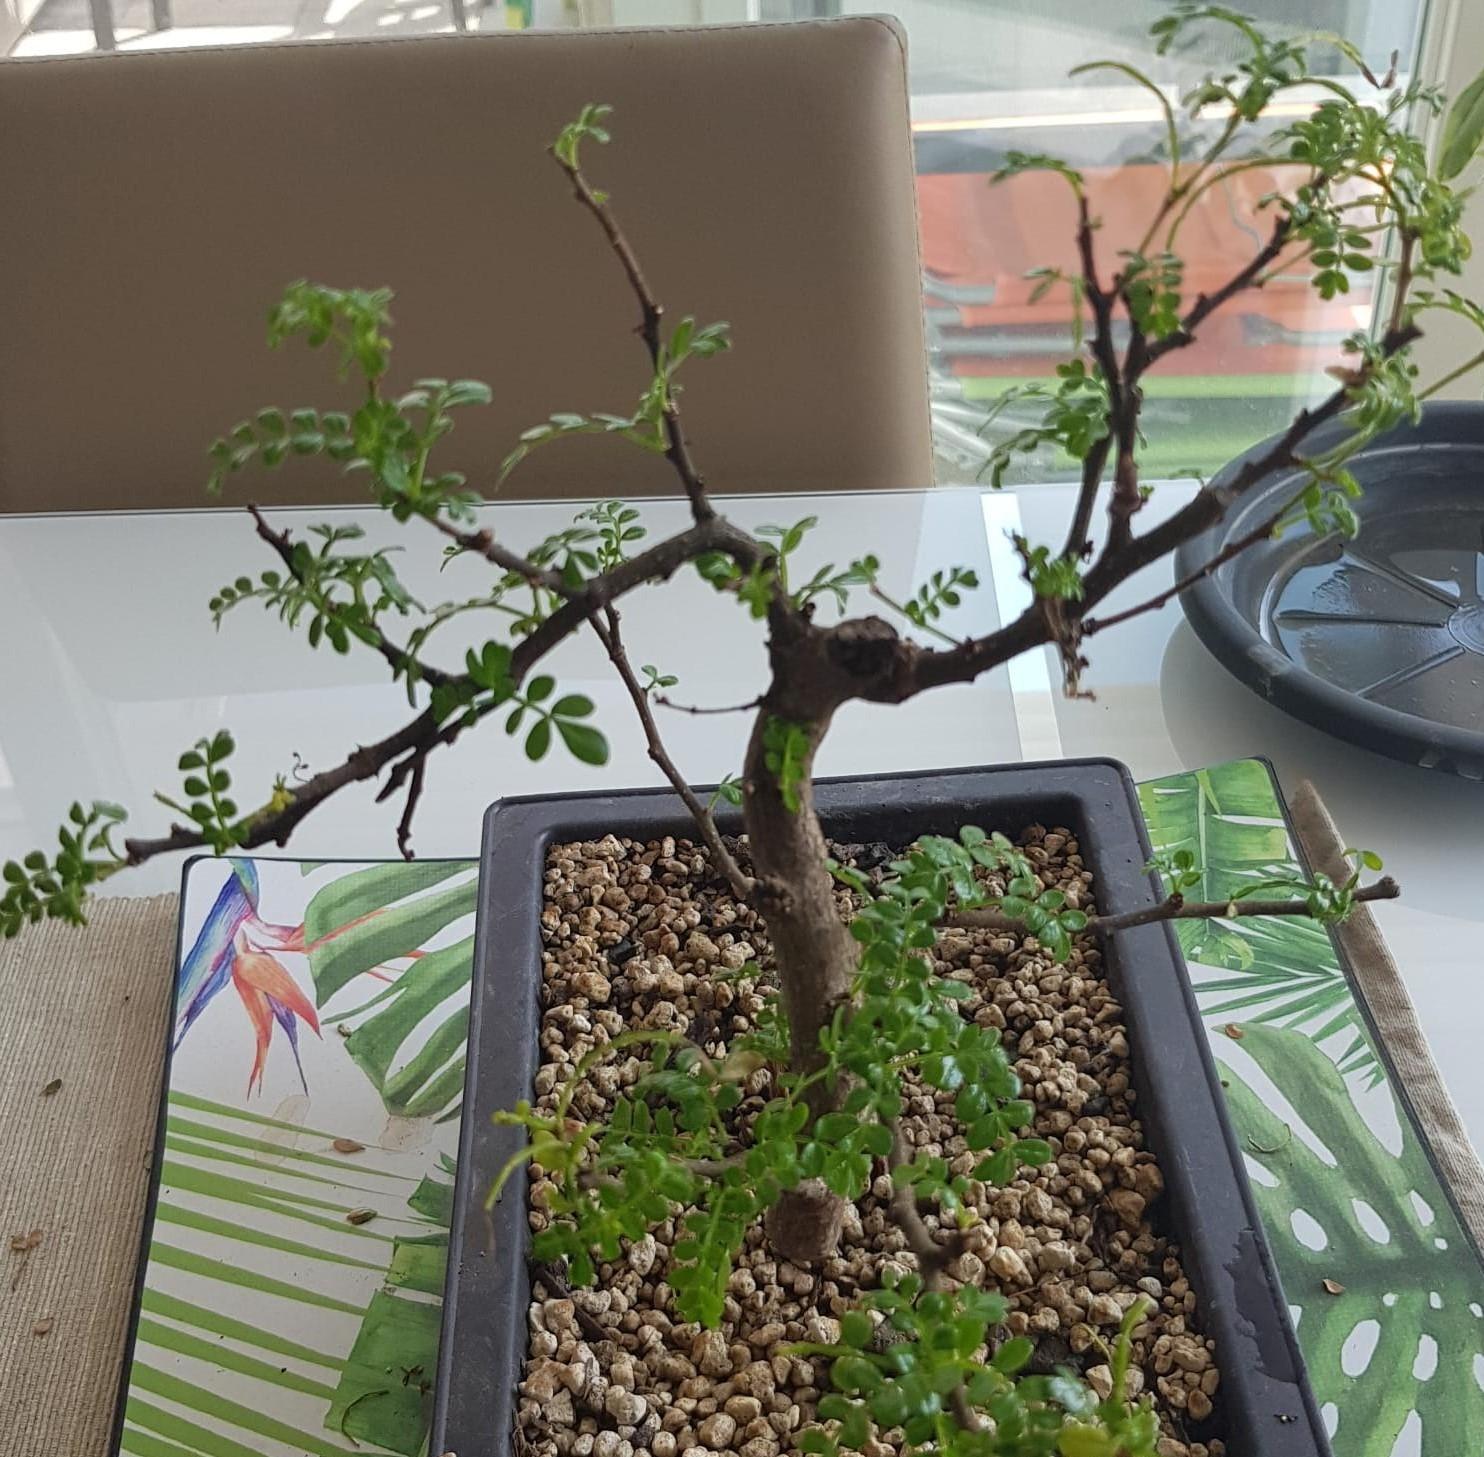 primo bonsai pepper tree: chiedo consigli - Pagina 2 WhatsApp-Image-2020-04-26-at-15.50.32